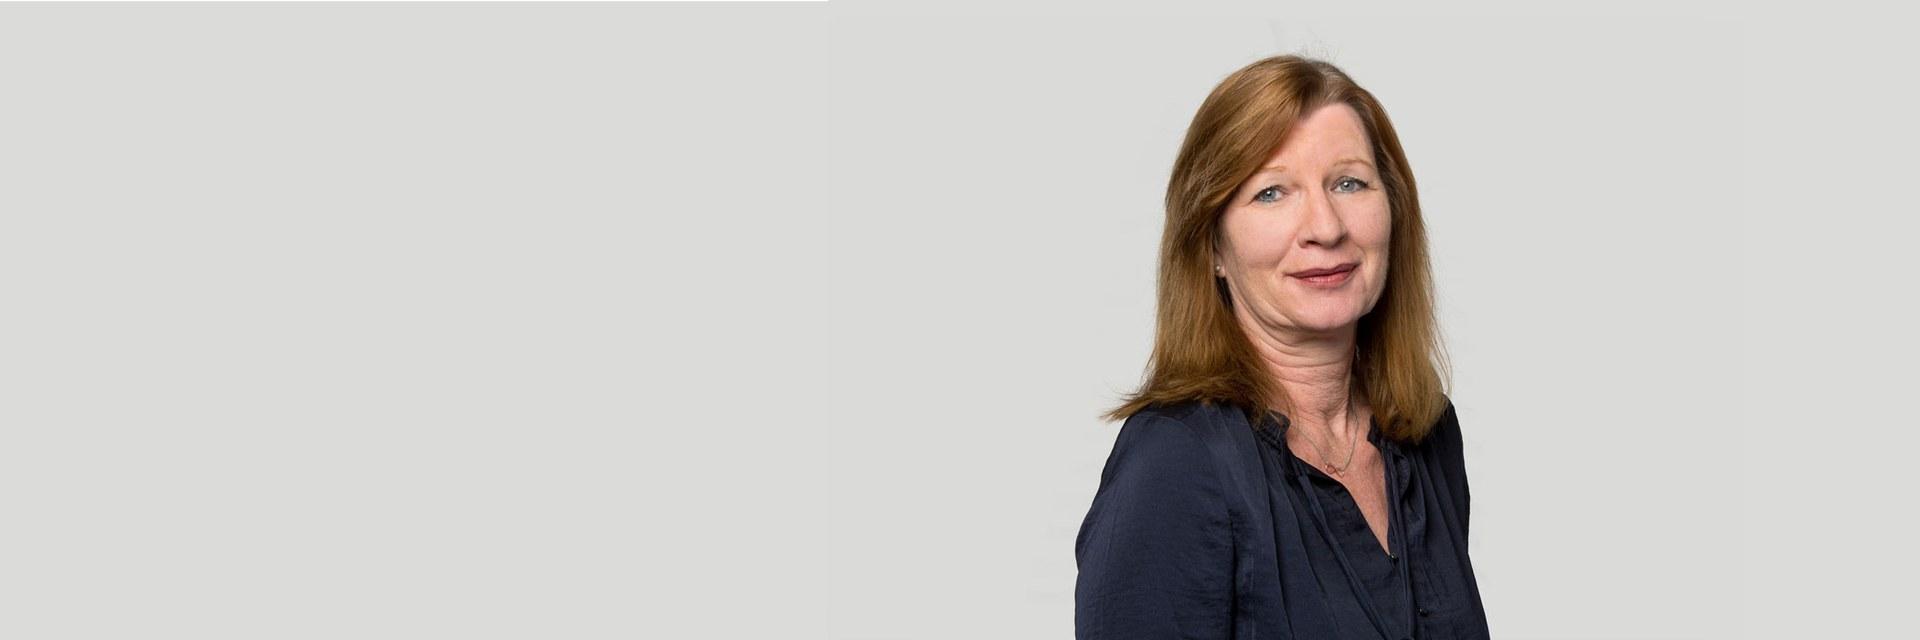 Linda Ackeret